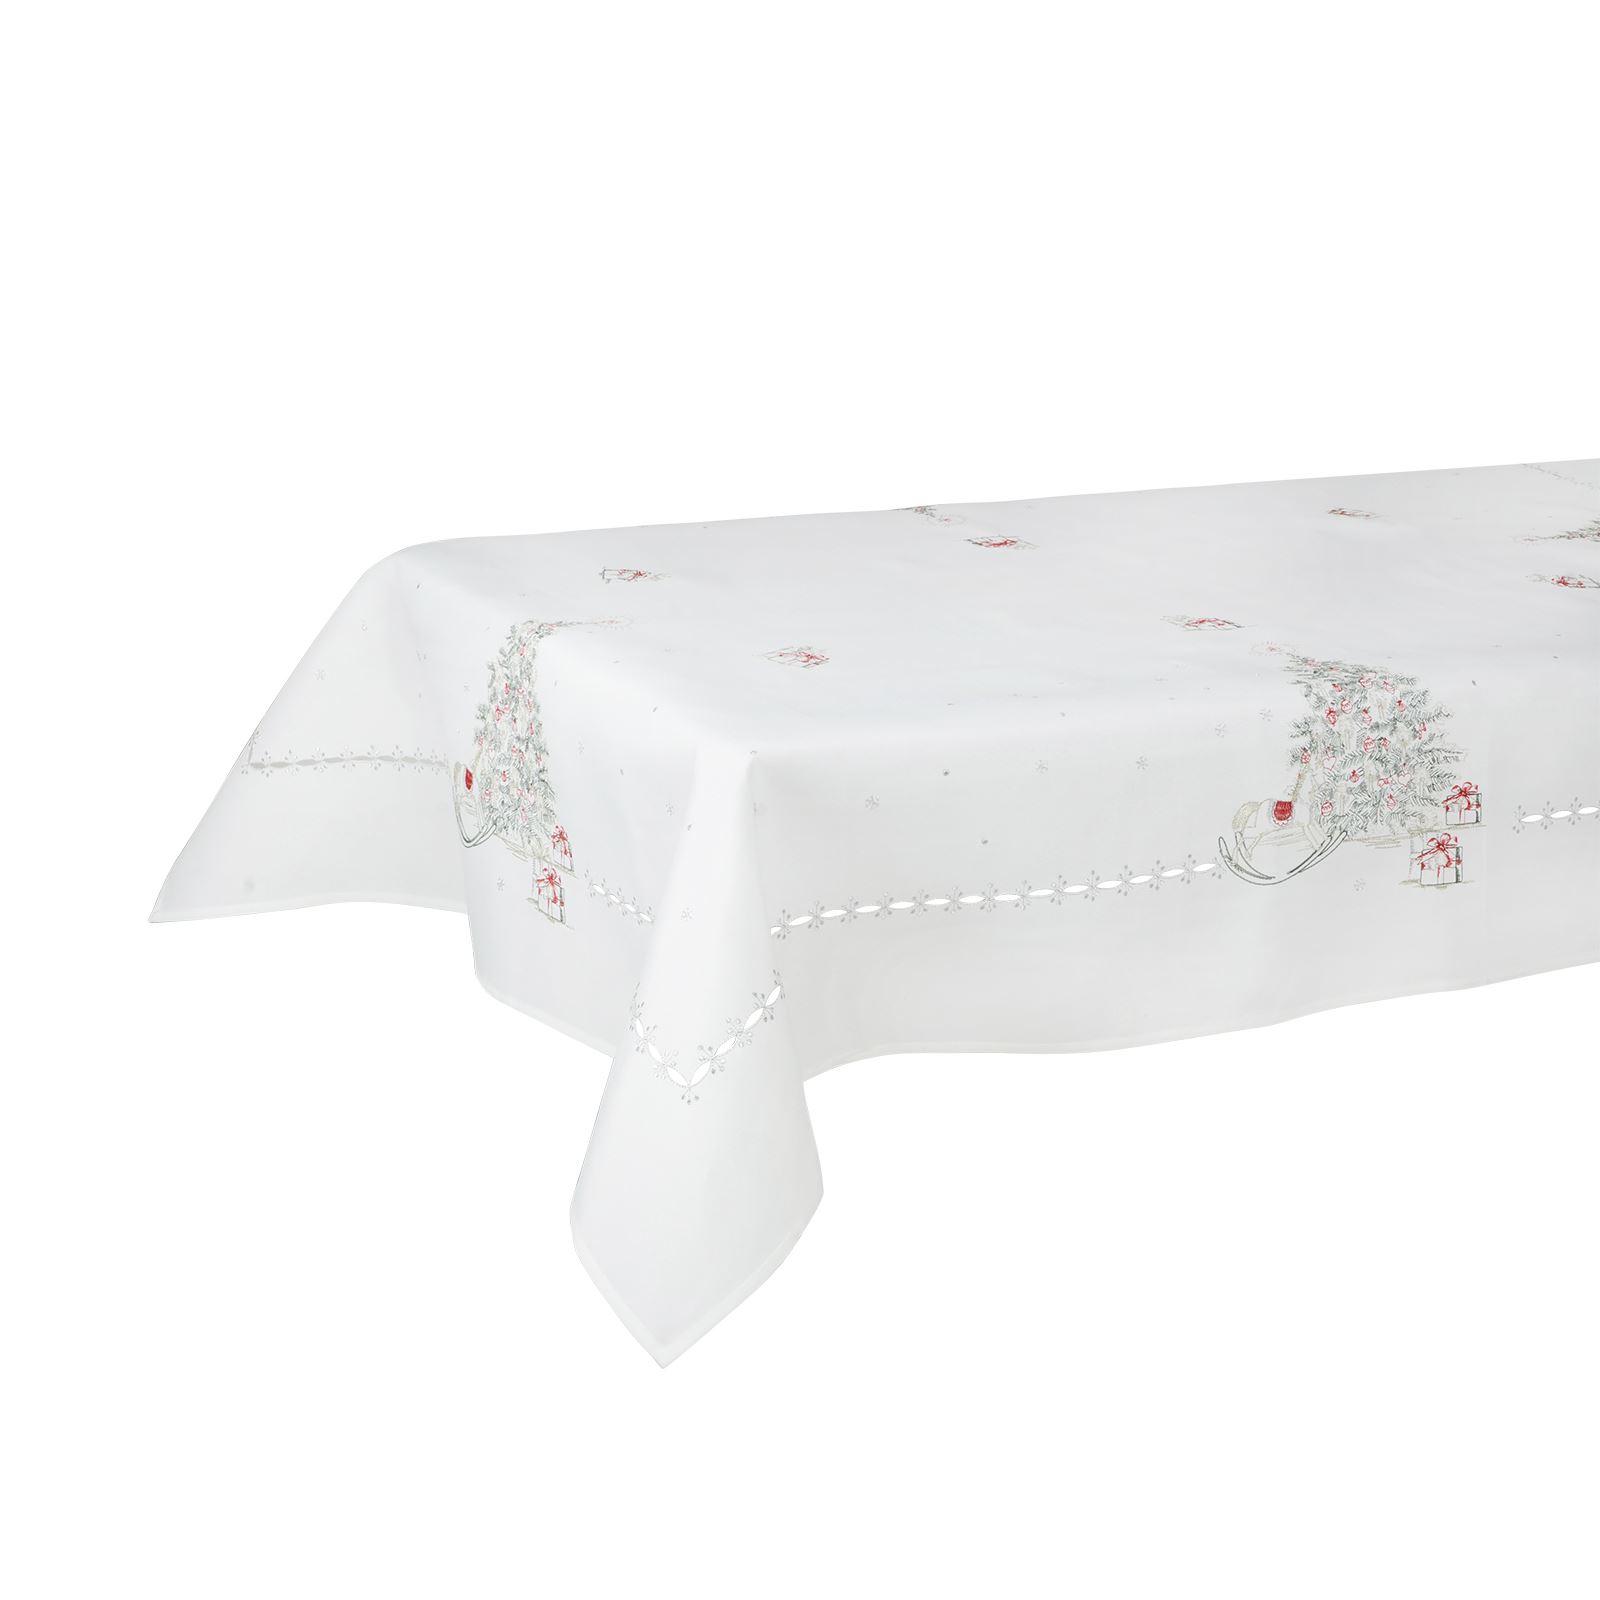 Christmas-Tablecloth-Festive-Pattern-Rectangle-Round-Fabric-Xmas-Room-Decoration Indexbild 142